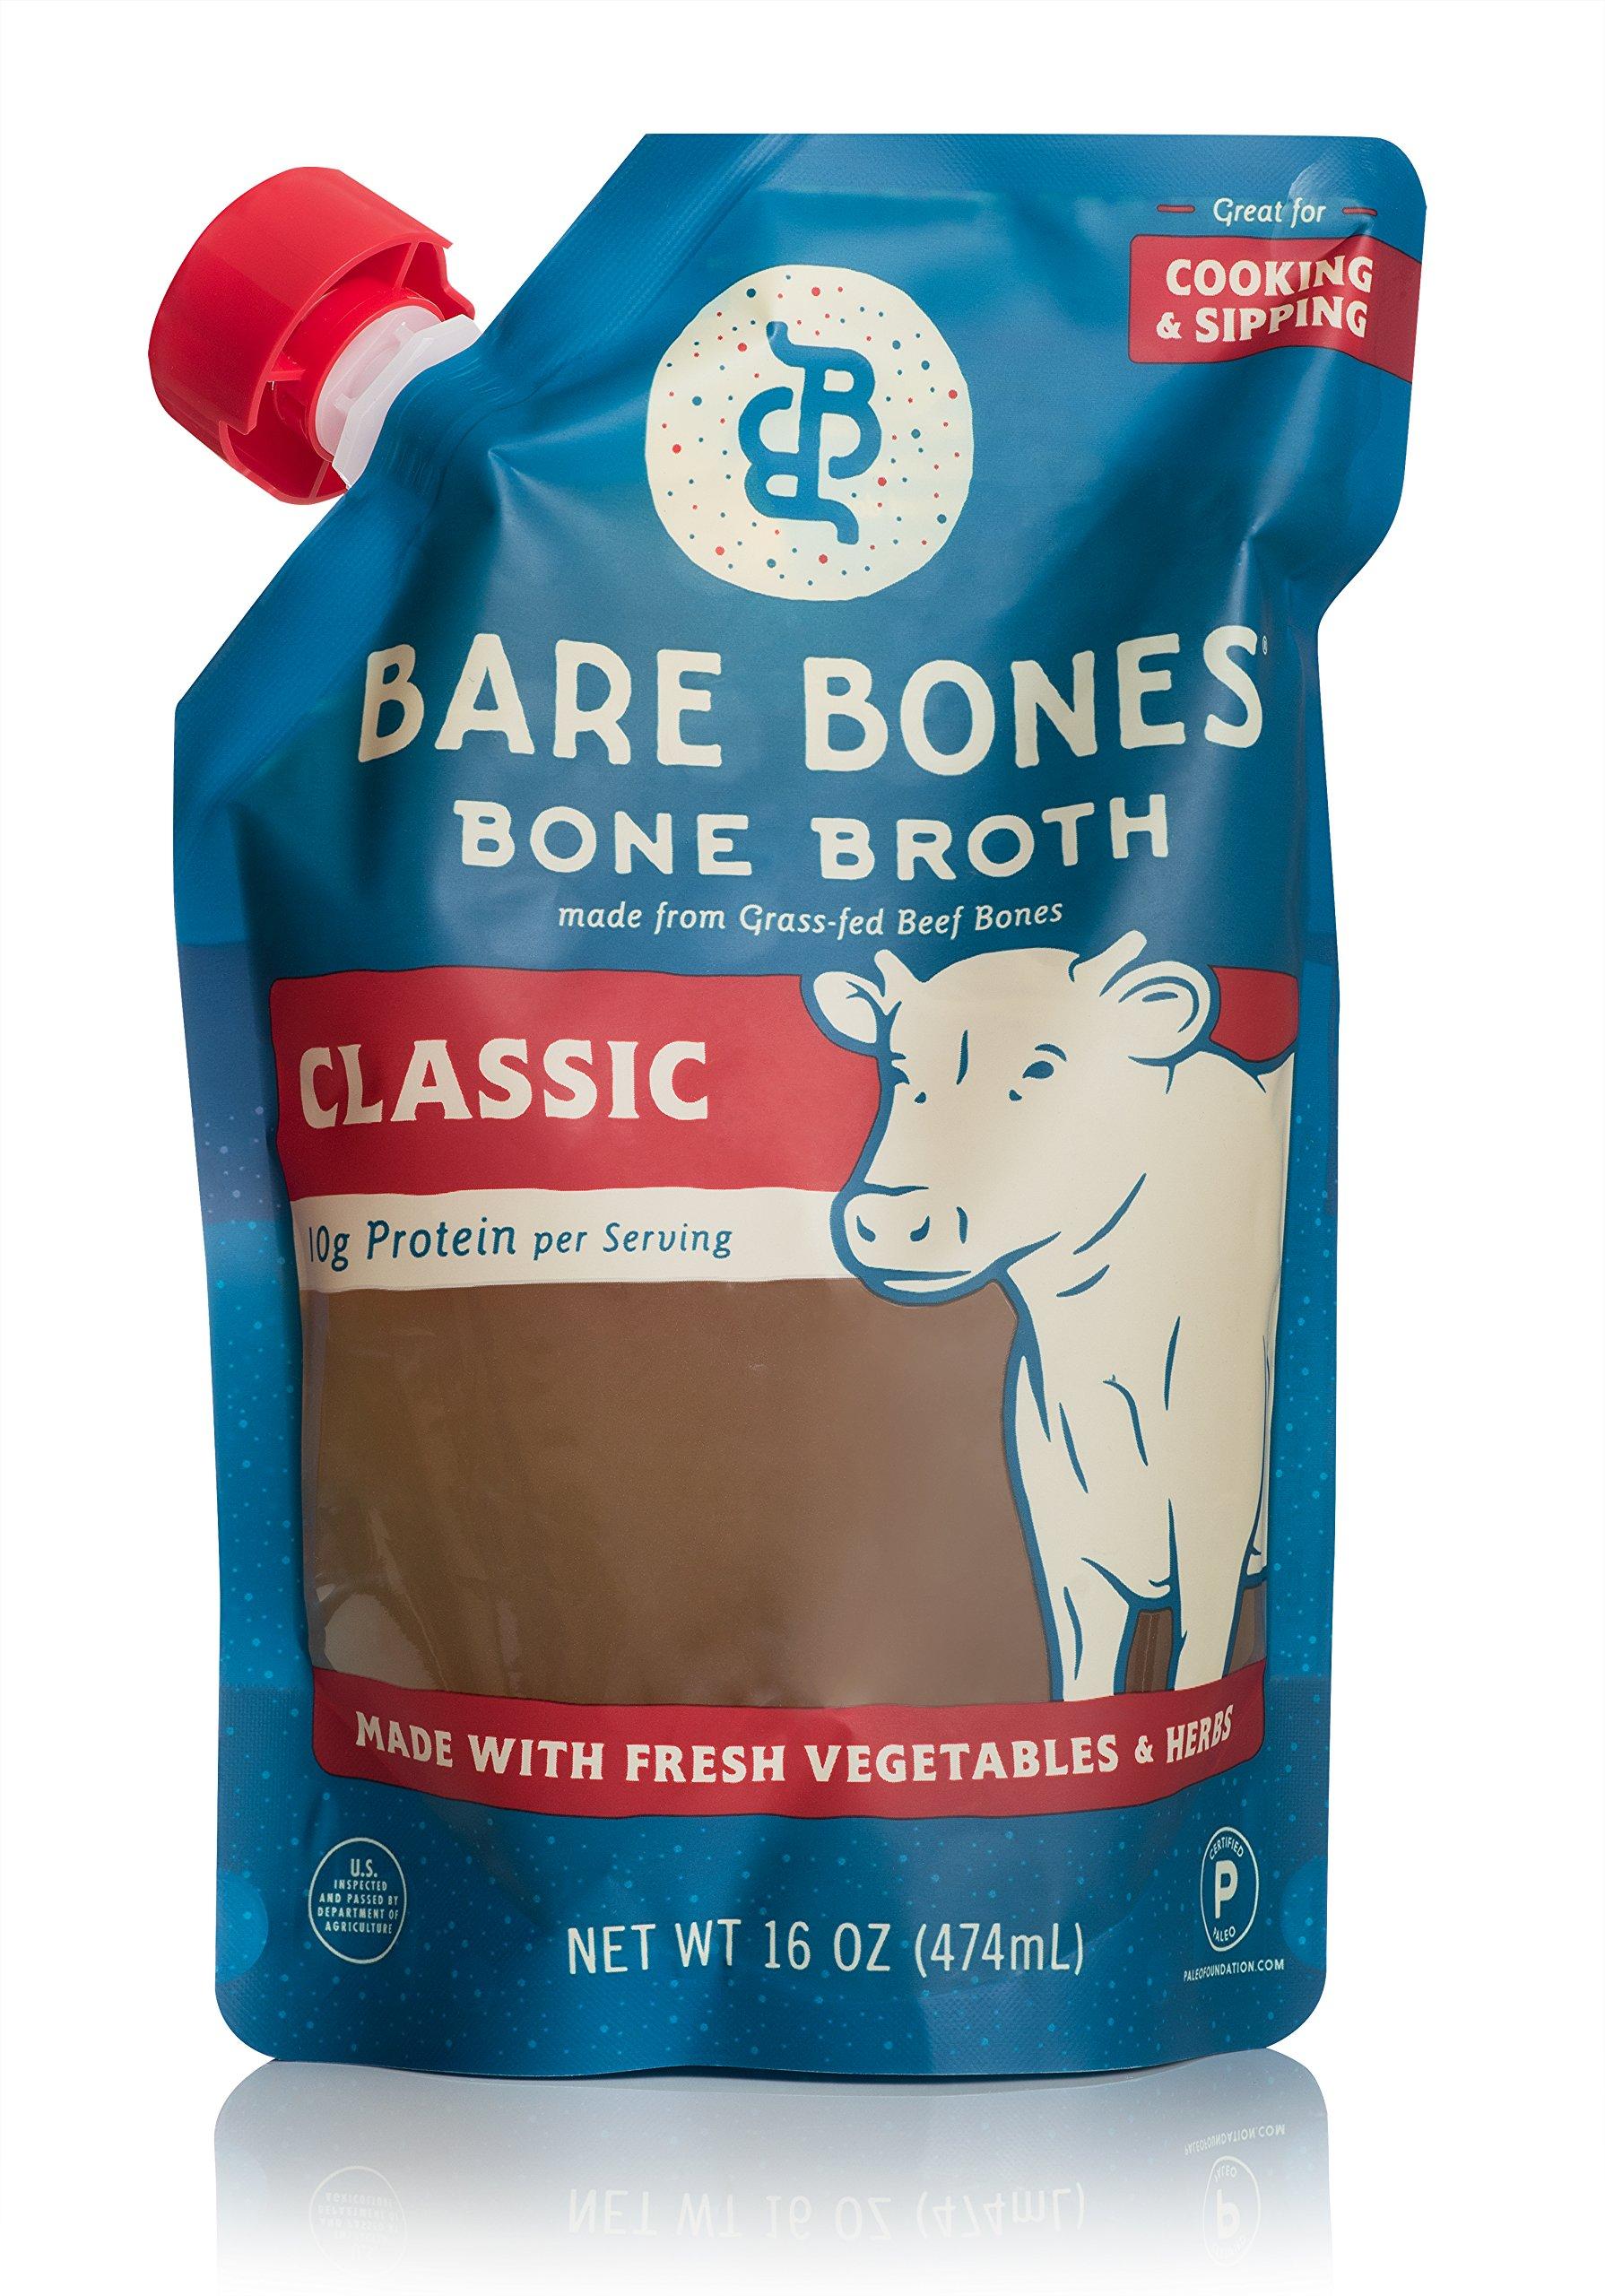 Beef Bone Broth by Bare Bones – 100% Grass-fed, Organic, Beef Bone Broth, Protein/Collagen-rich, 16 oz (4 Pack)